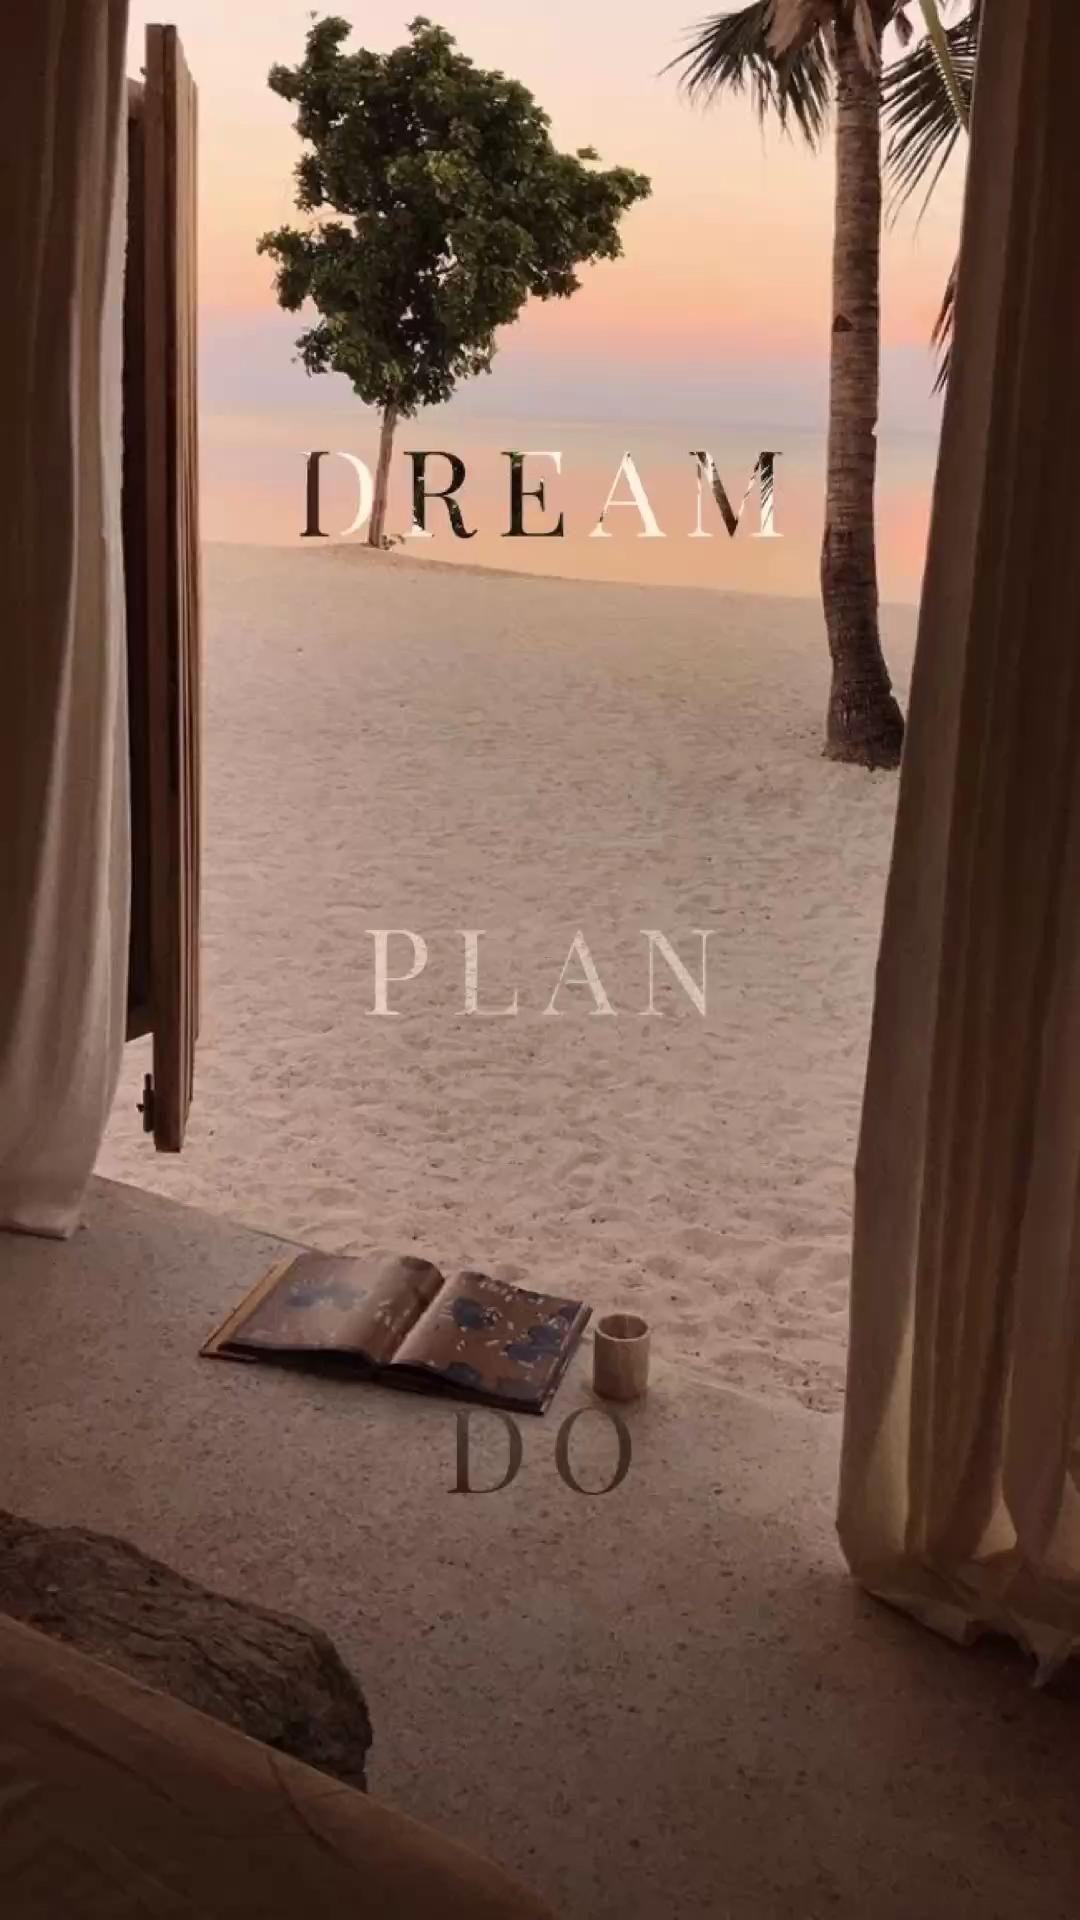 COFFEE QUOTES ☕️✨ WALLPAPER🌙    DREAM PLAN DO